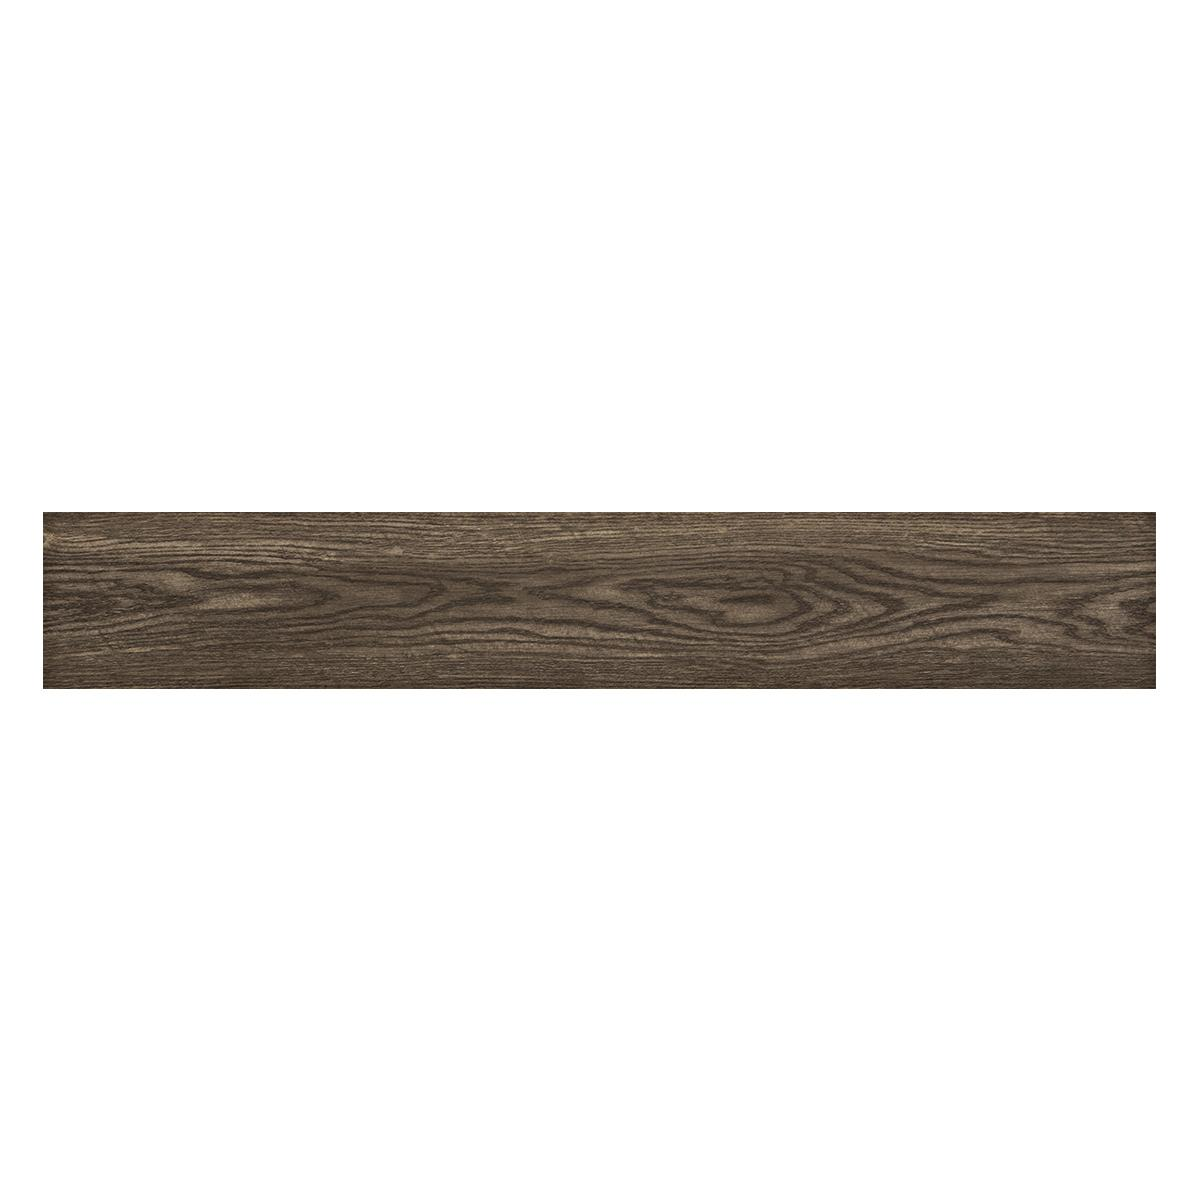 Piso PVC Manhattan Roble Verna Mate - 18.4X12.2 - 2.24 m2